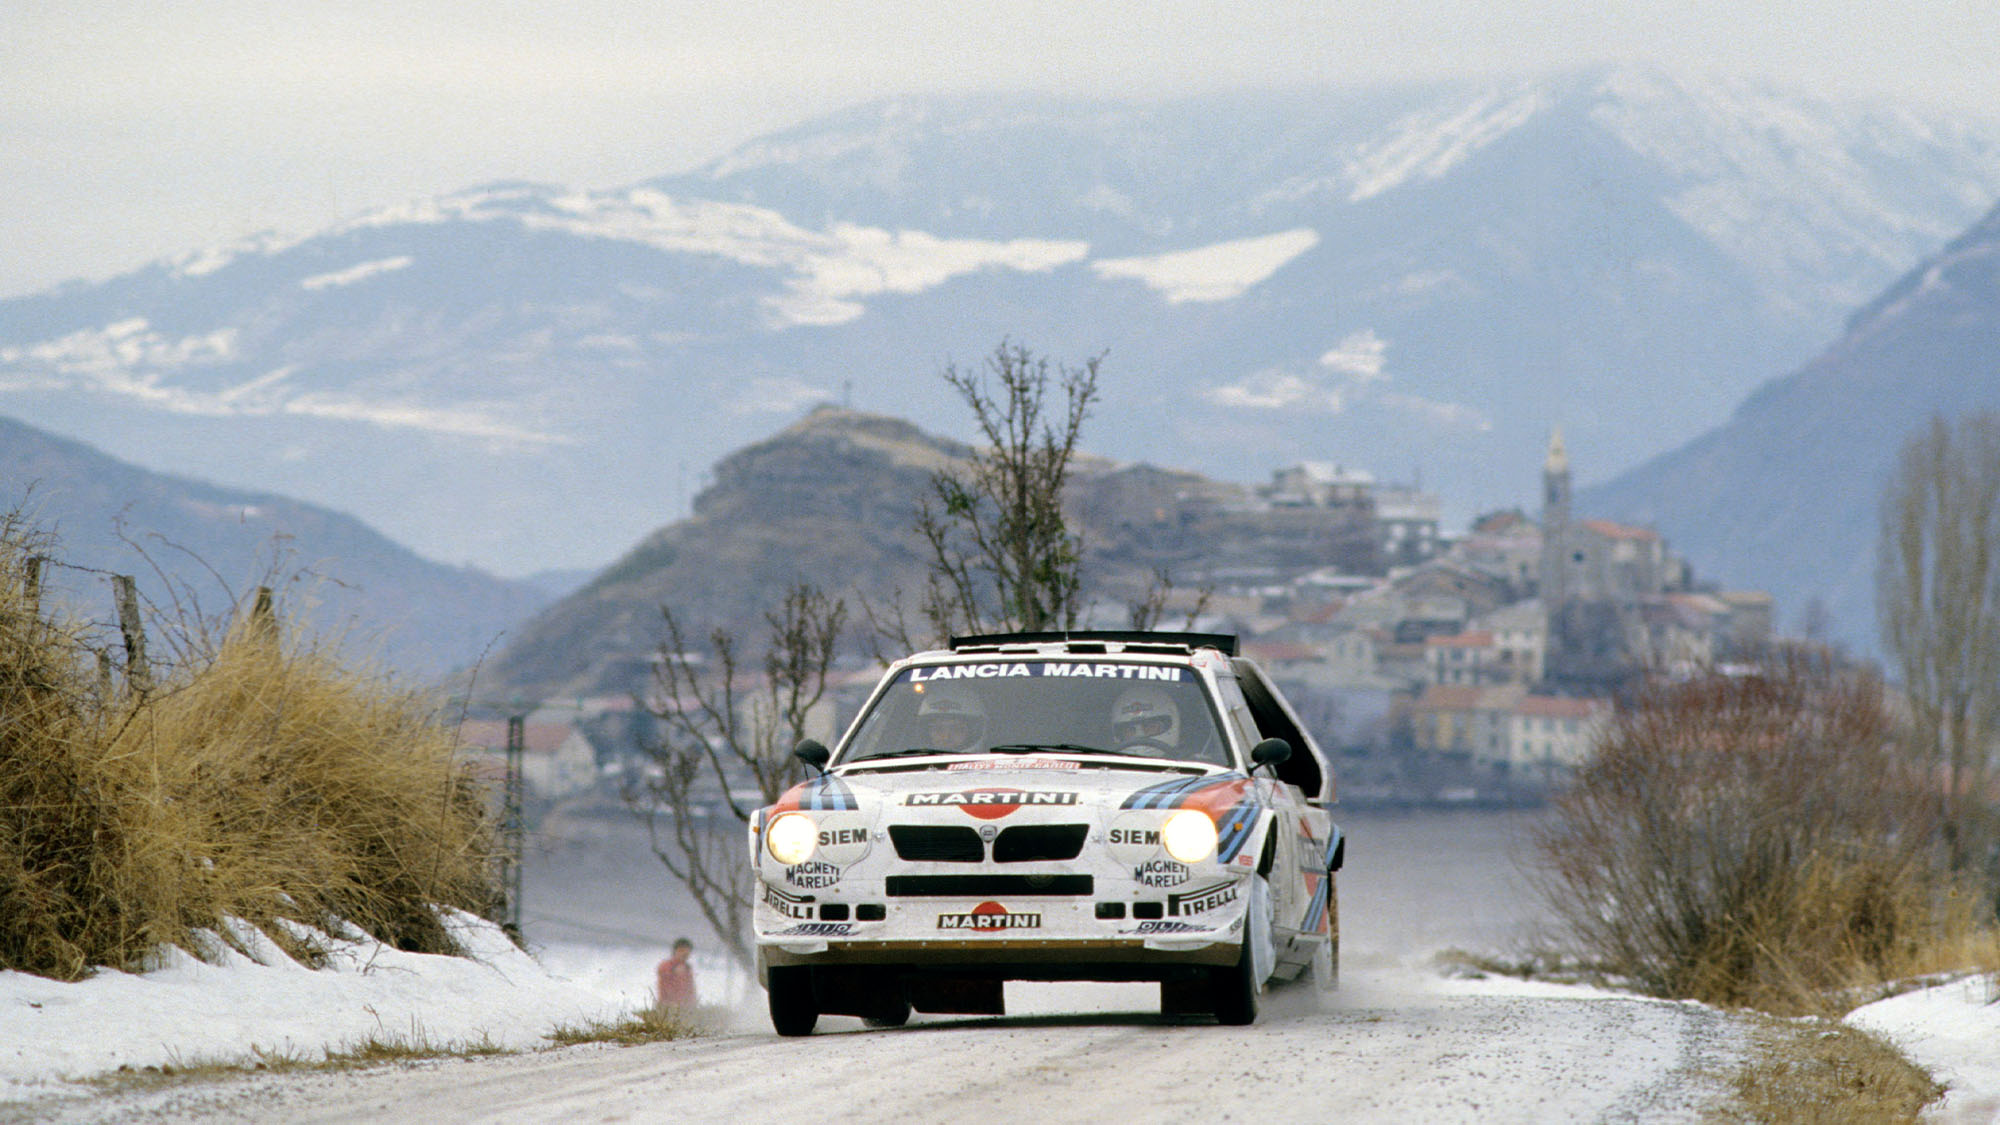 MOTORSPORT - WRC 1986 - RALLYE MONTE CARLO - PHOTO: DPPI HENRI TOIVONEN (FIN) / SERGIO CRESTO - LANCIA DELTA S4 - ACTION